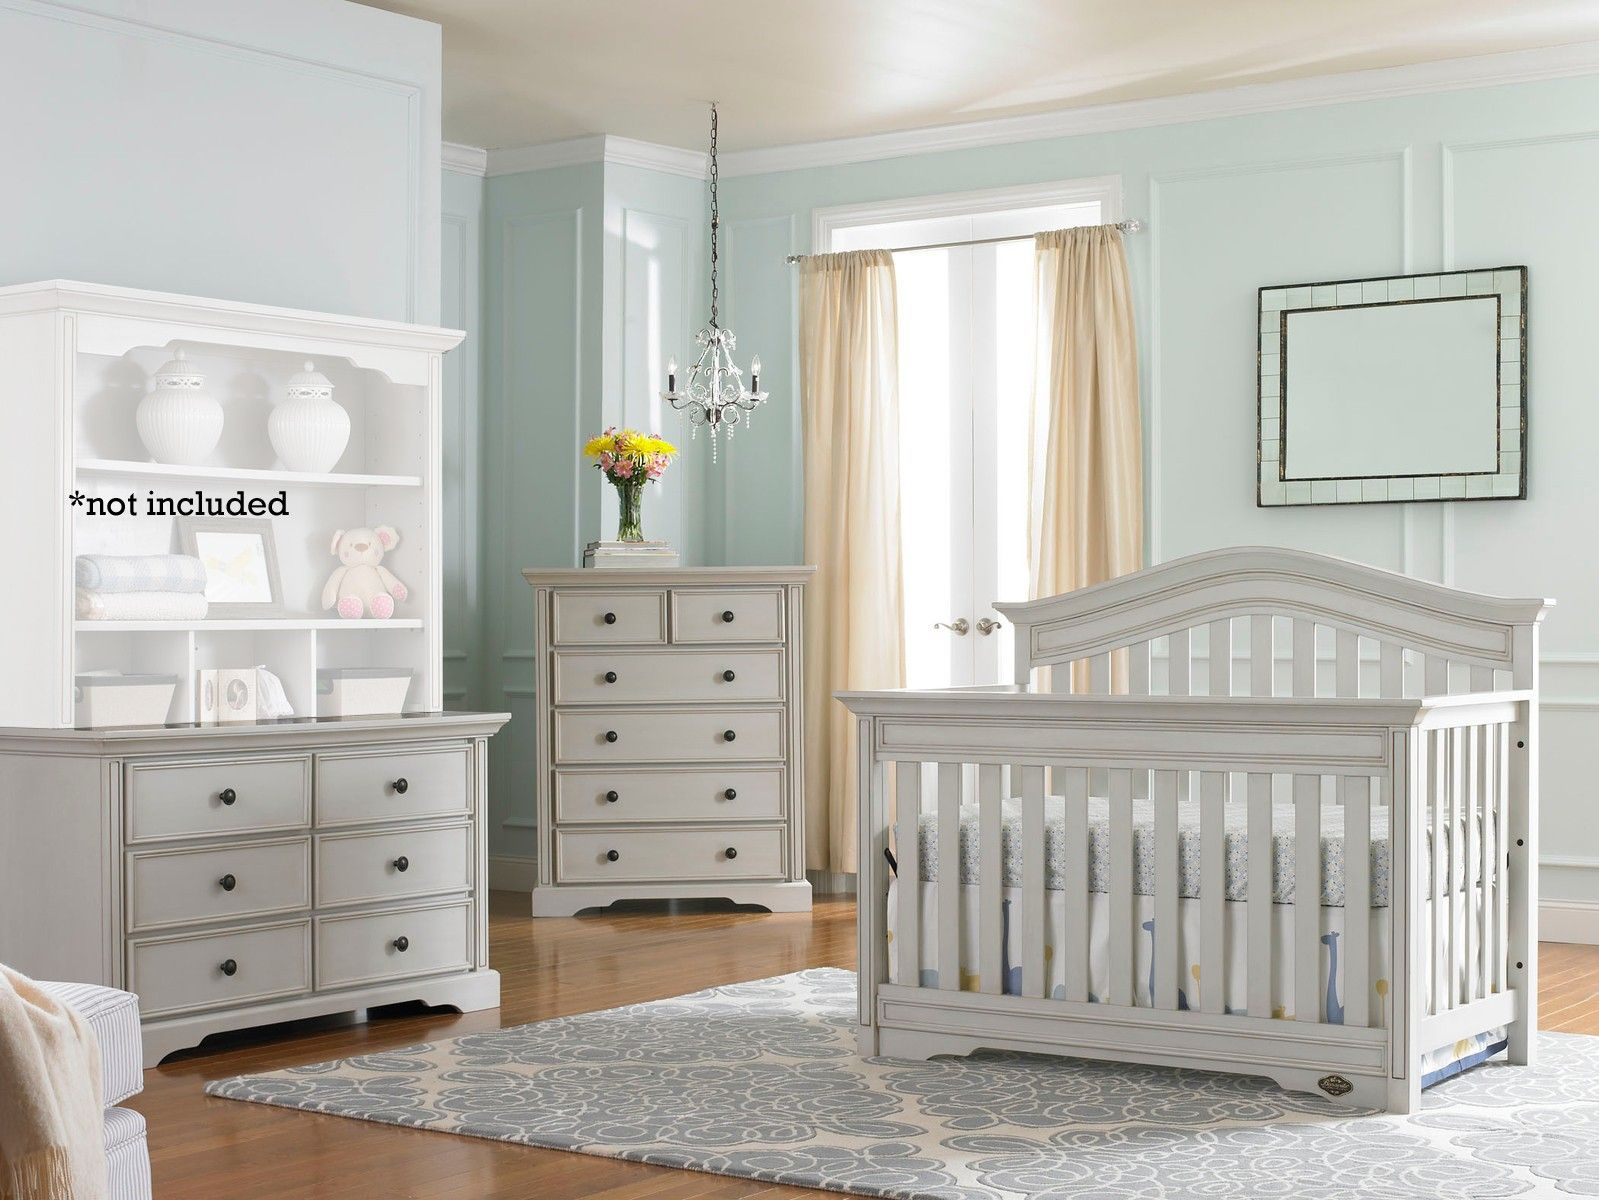 Bonavita Westfield 3 Piece Nursery Set in Linen Gray - Crib, Dresser ...